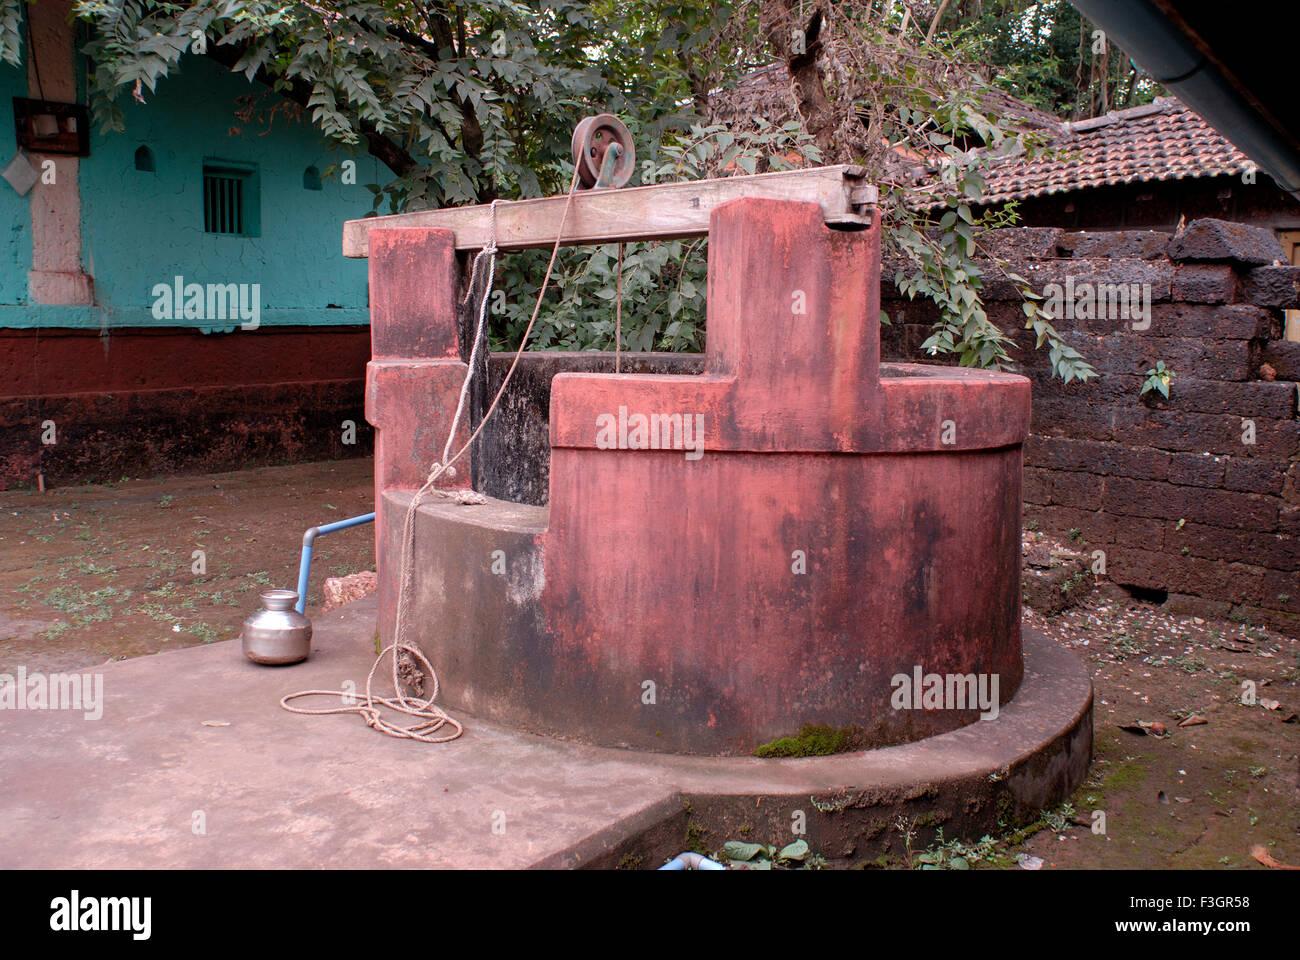 A old well at the temple of shree Devi Bhagvati ; Sansthan ; Village Kotkamte ; district Sindhudurga ; Maharashtra - Stock Image